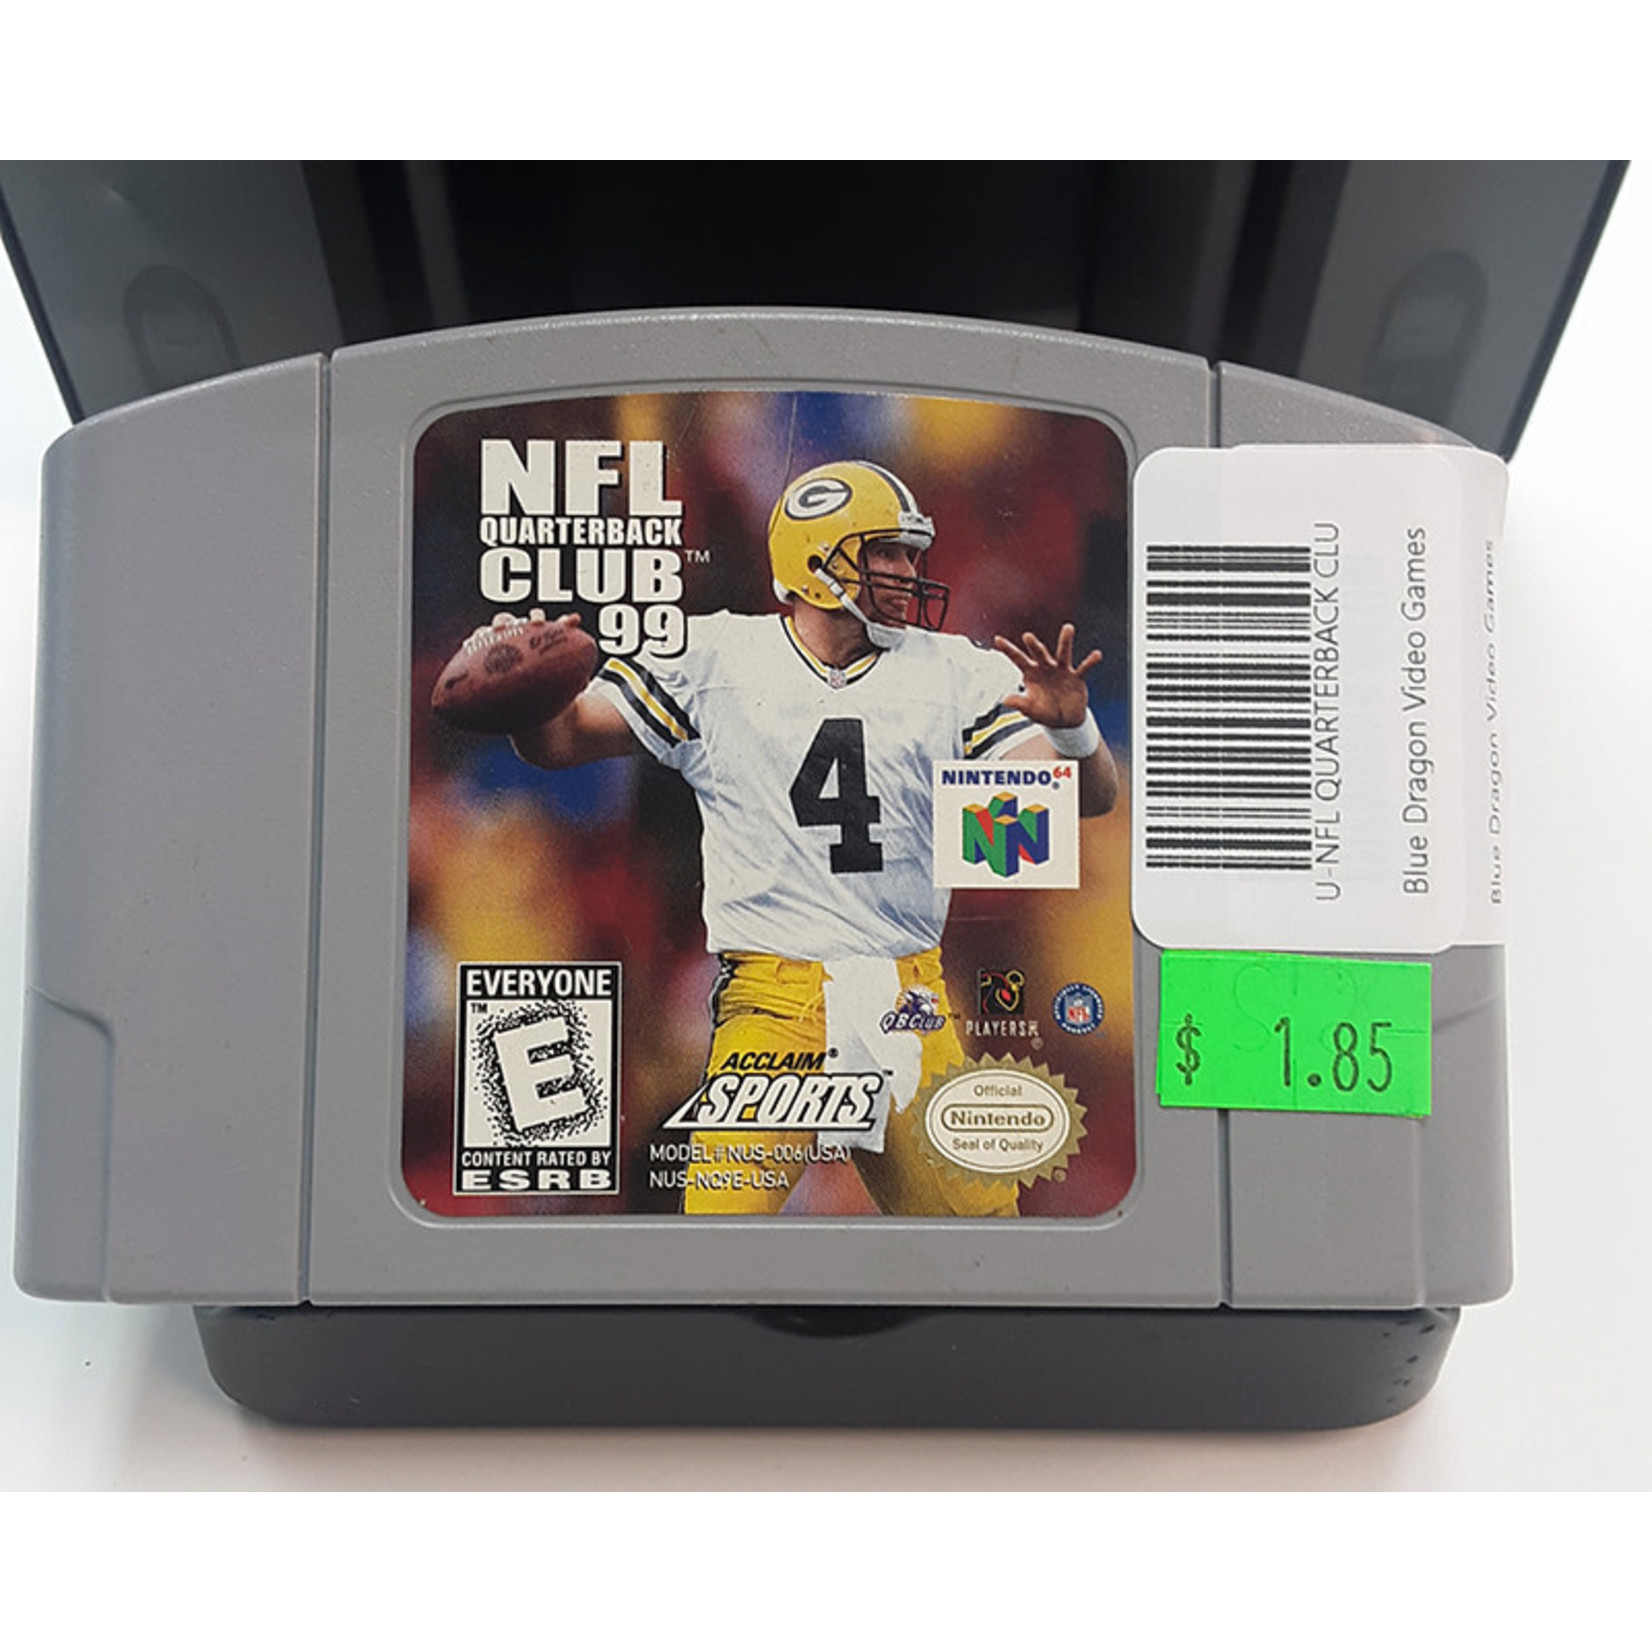 N64U-NFL QUARTERBACK CLUB 99 (cartridge)